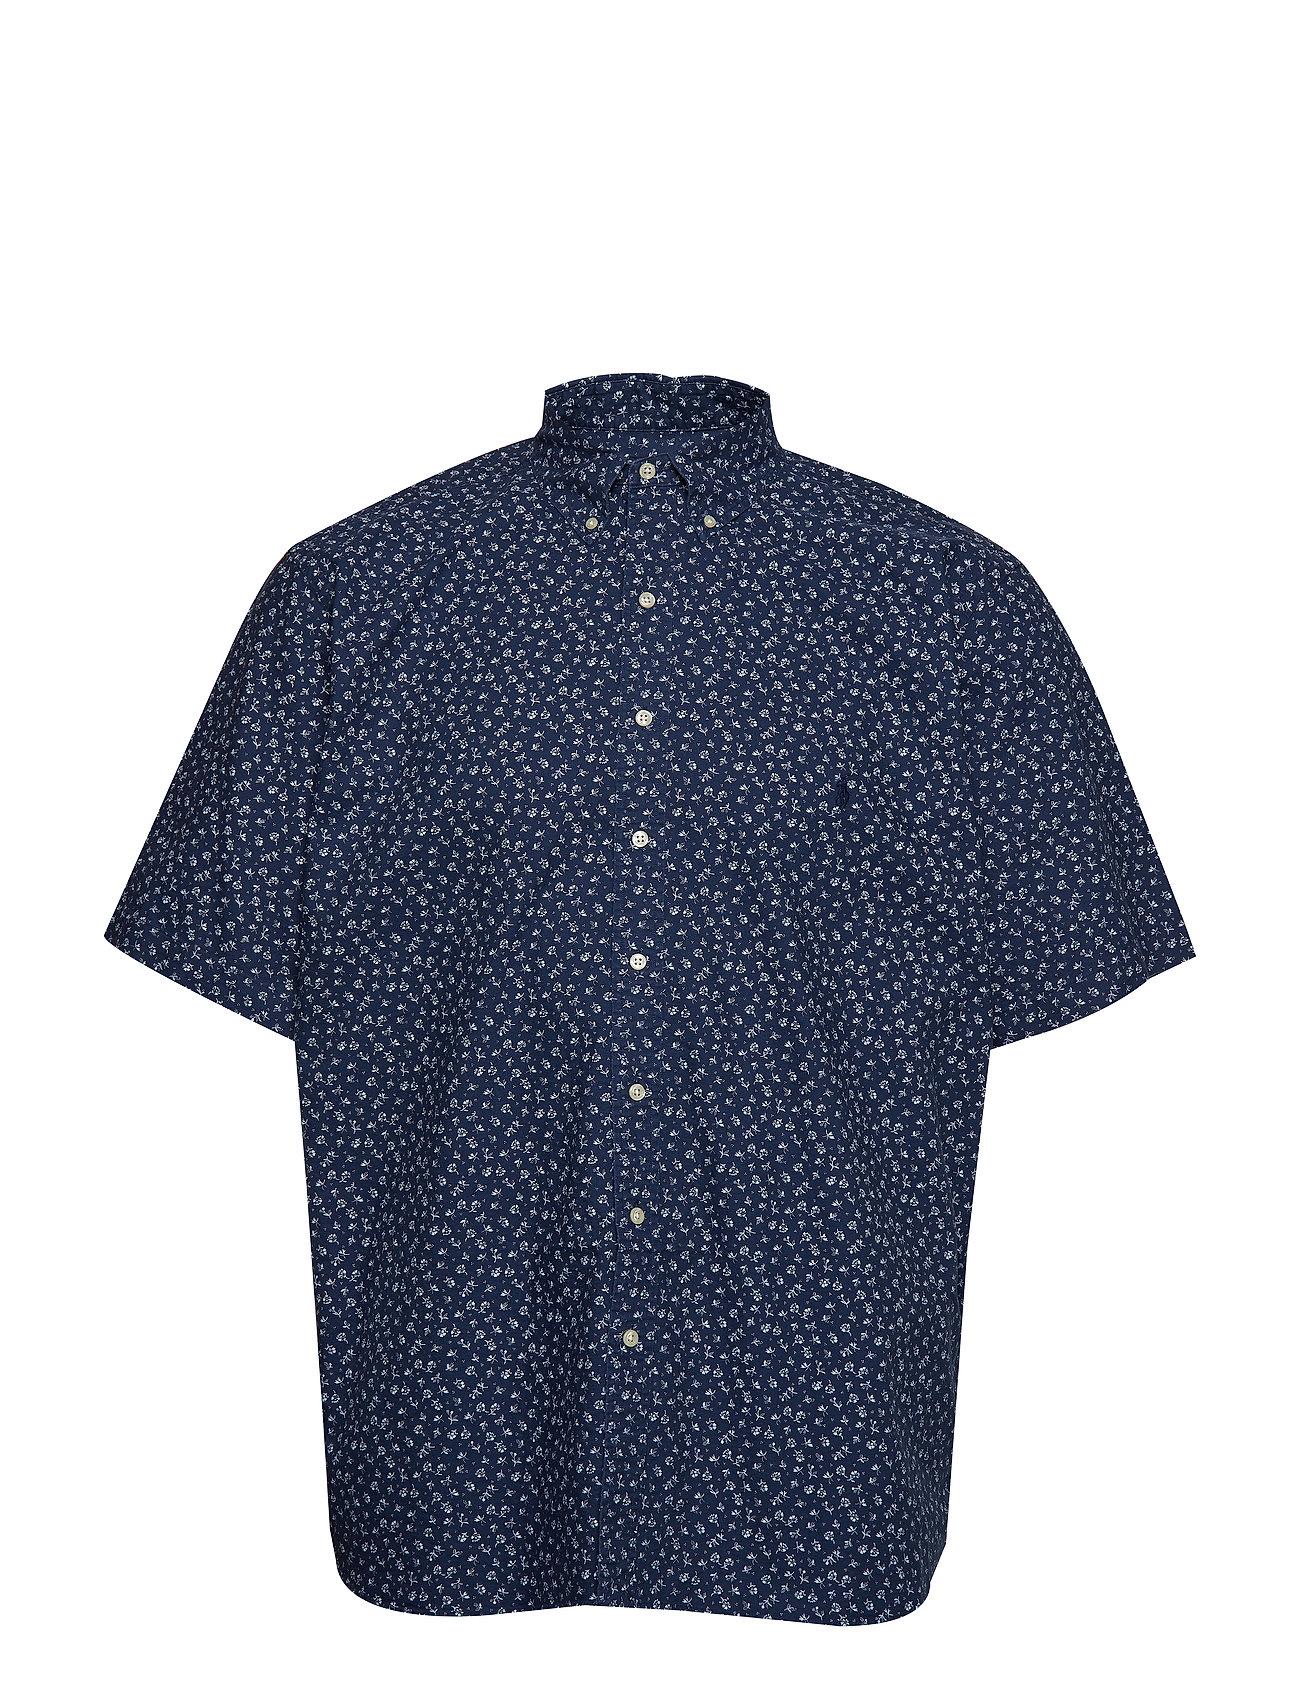 Polo Ralph Lauren Big & Tall Classic Fit Floral Shirt